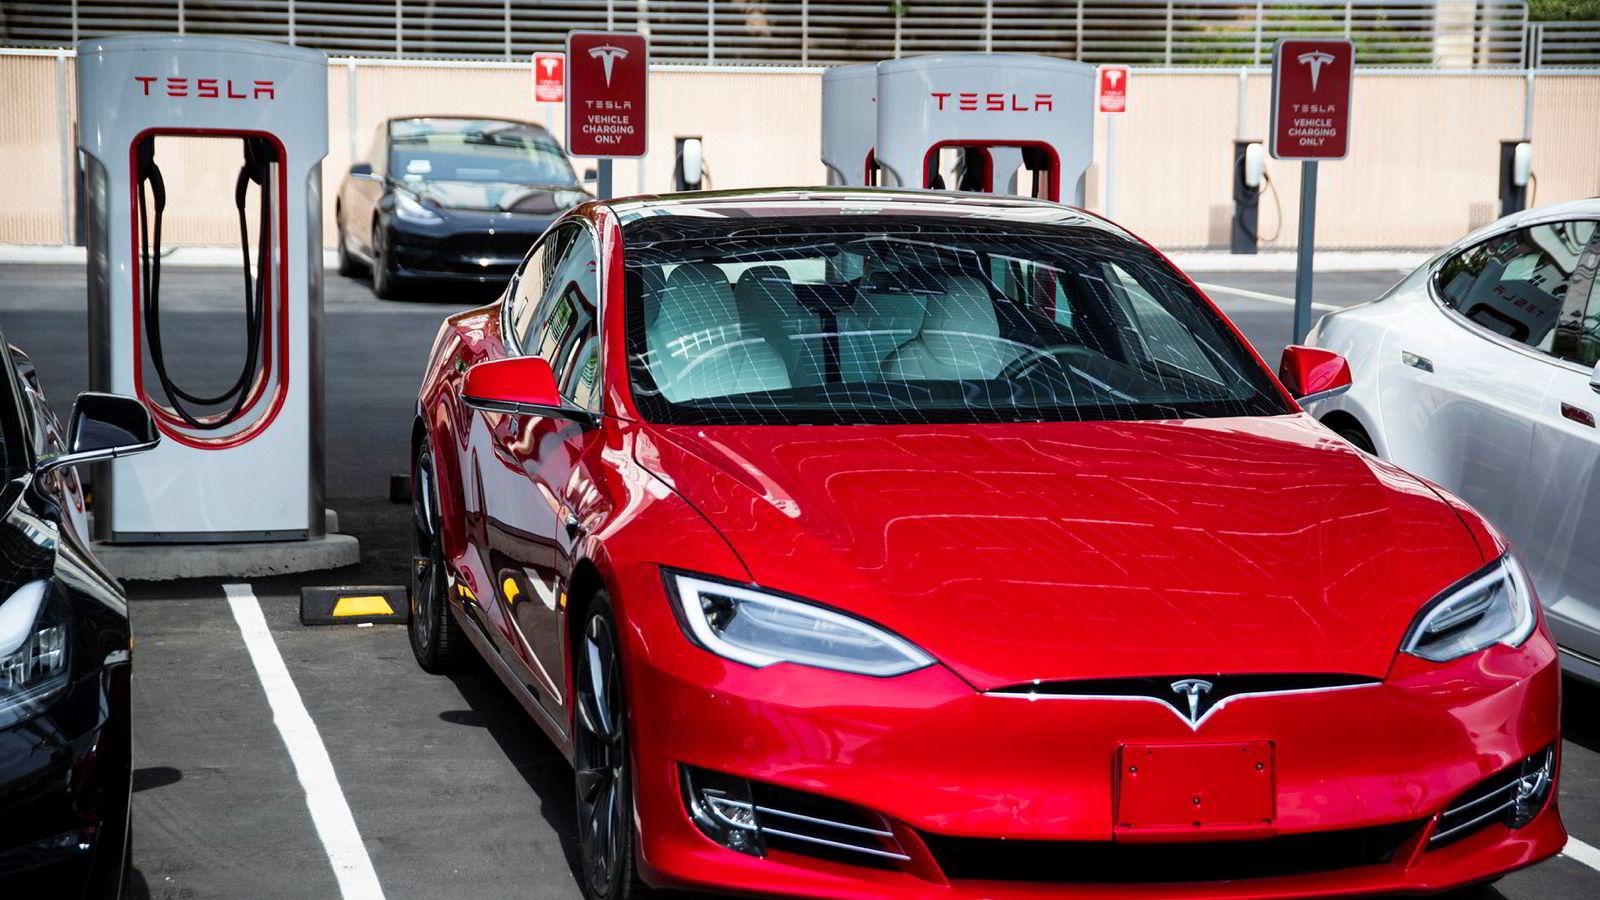 Tesla nådde ikke produksjonsmålet for tredje kvartal. Illustrasjonsfoto: Wade Vandervort / Las Vegas Sun via AP / NTB scanpix